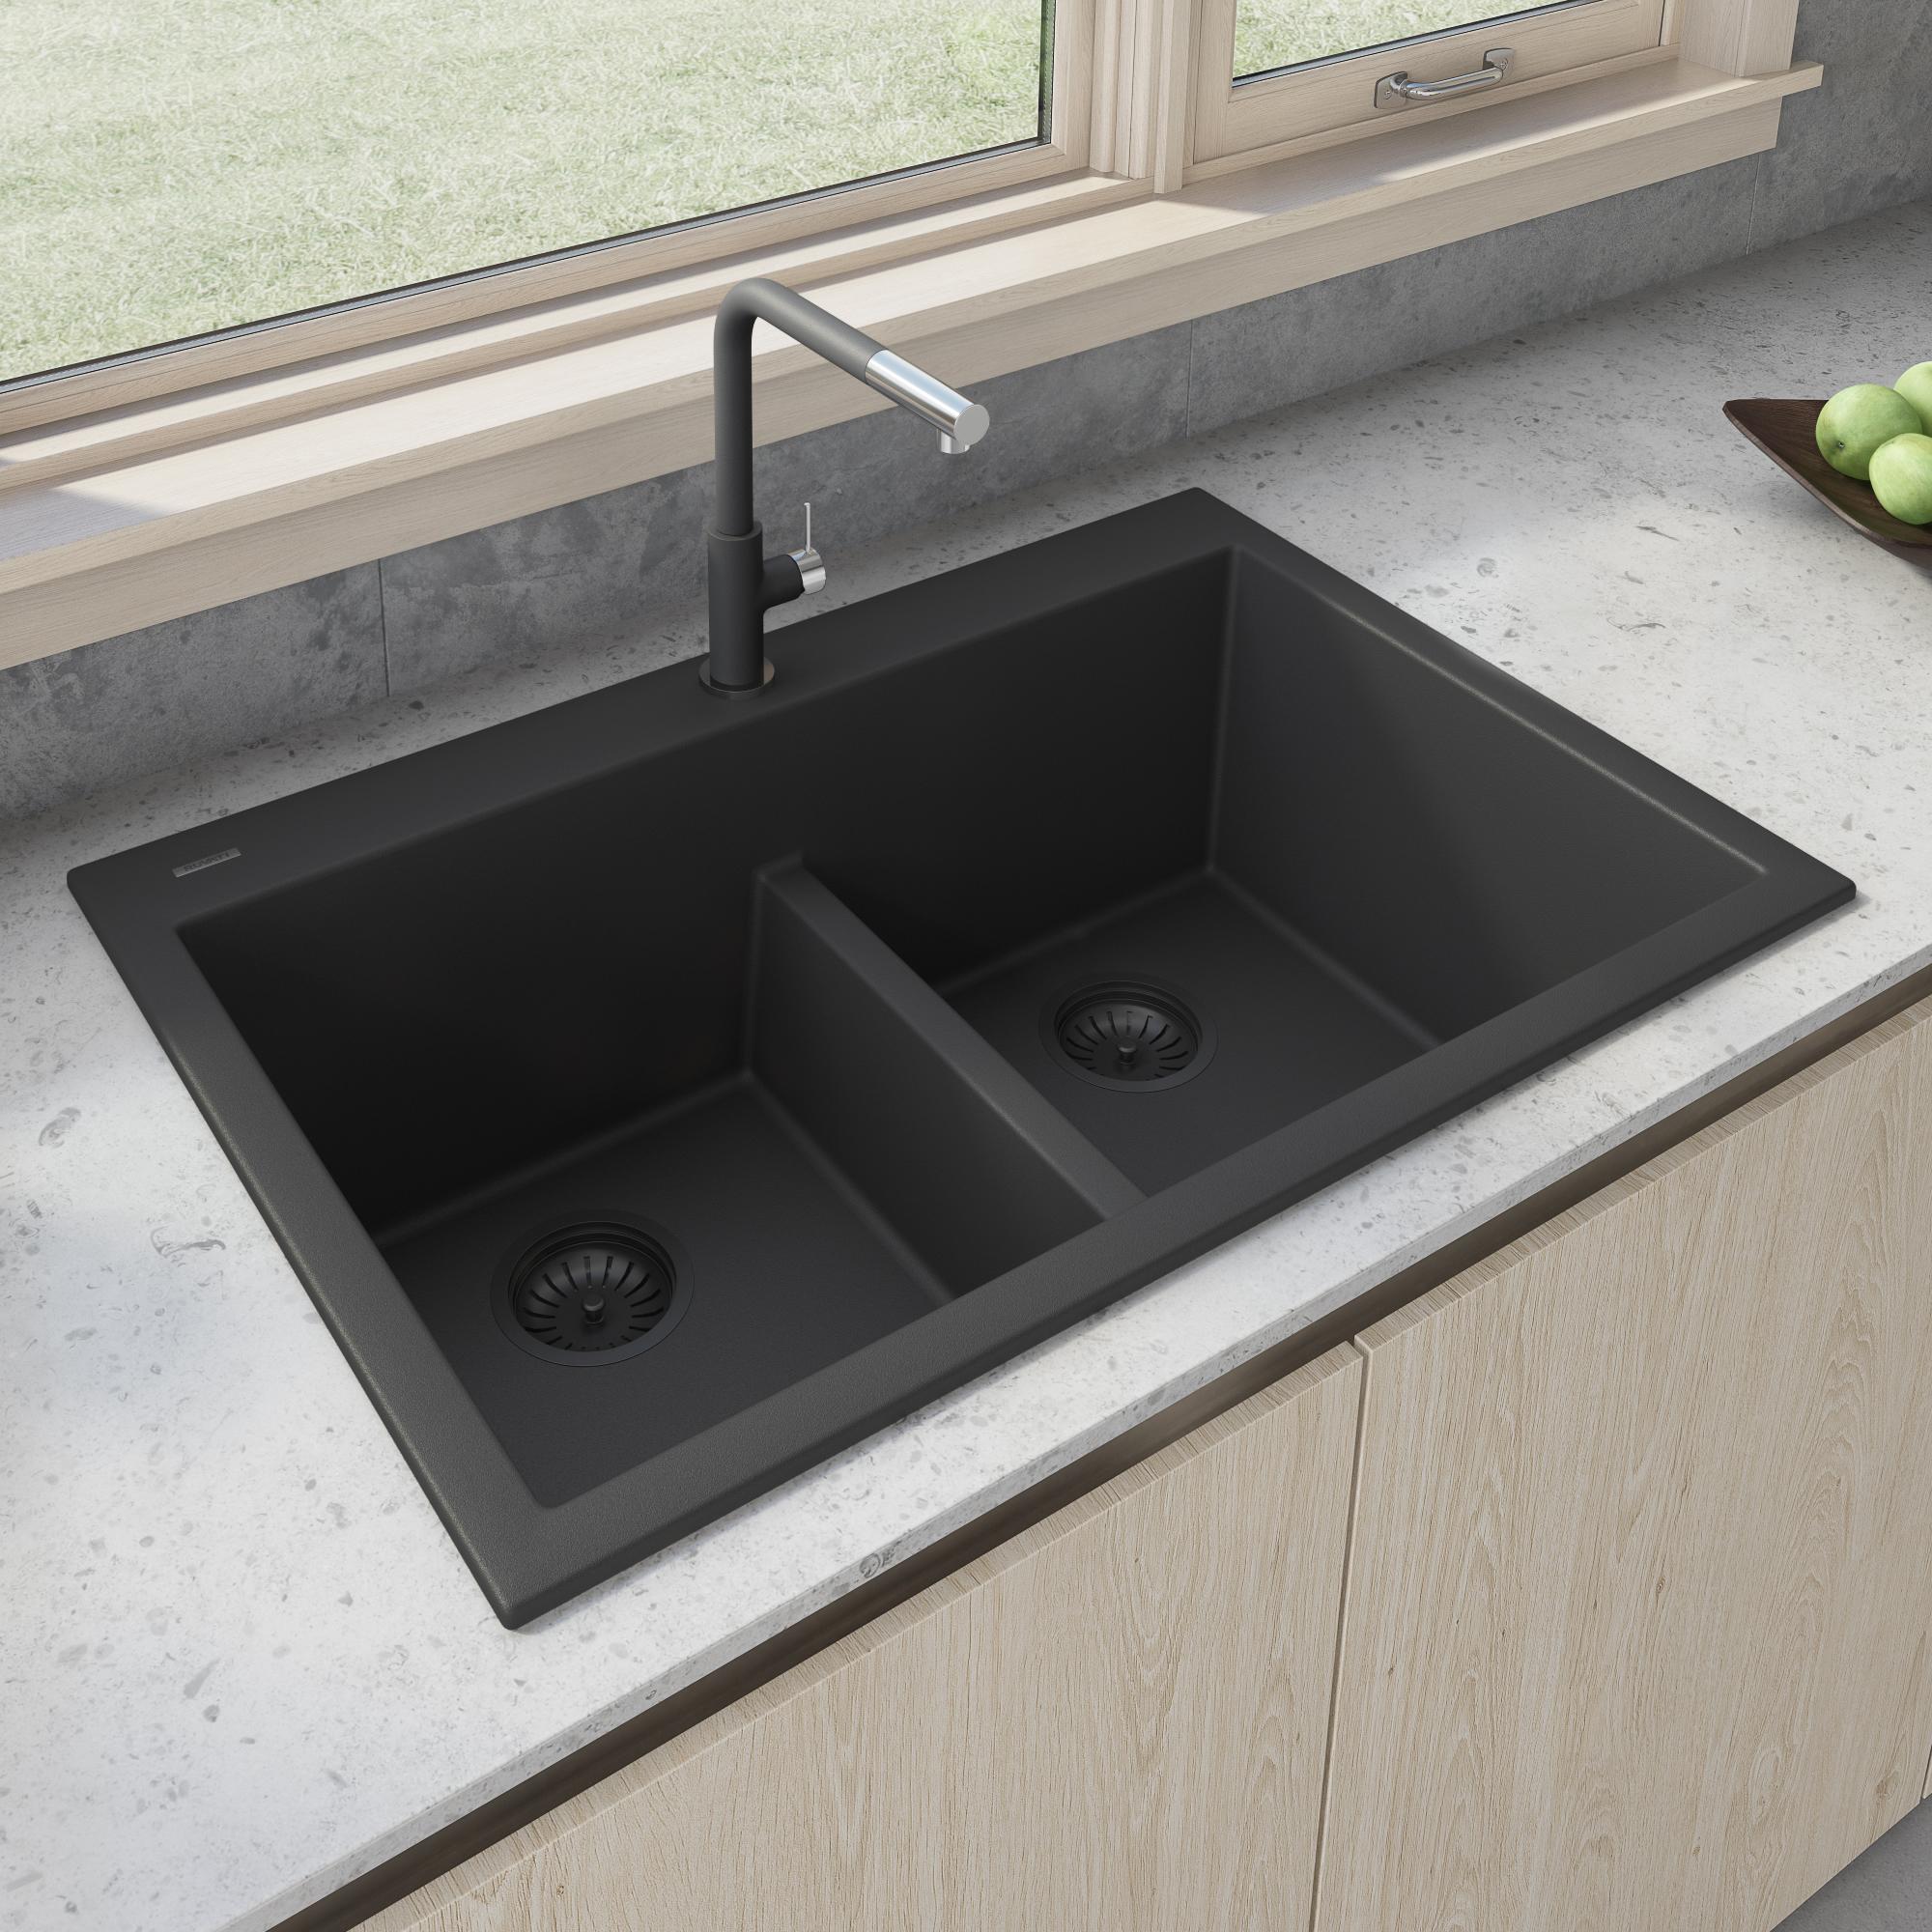 Ruvati 33 X 22 Inch Epigranite Drop In Topmount Granite Composite Double Bowl Low Divide Kitchen Sink Midnight Black Rvg1385bk Ruvati Usa